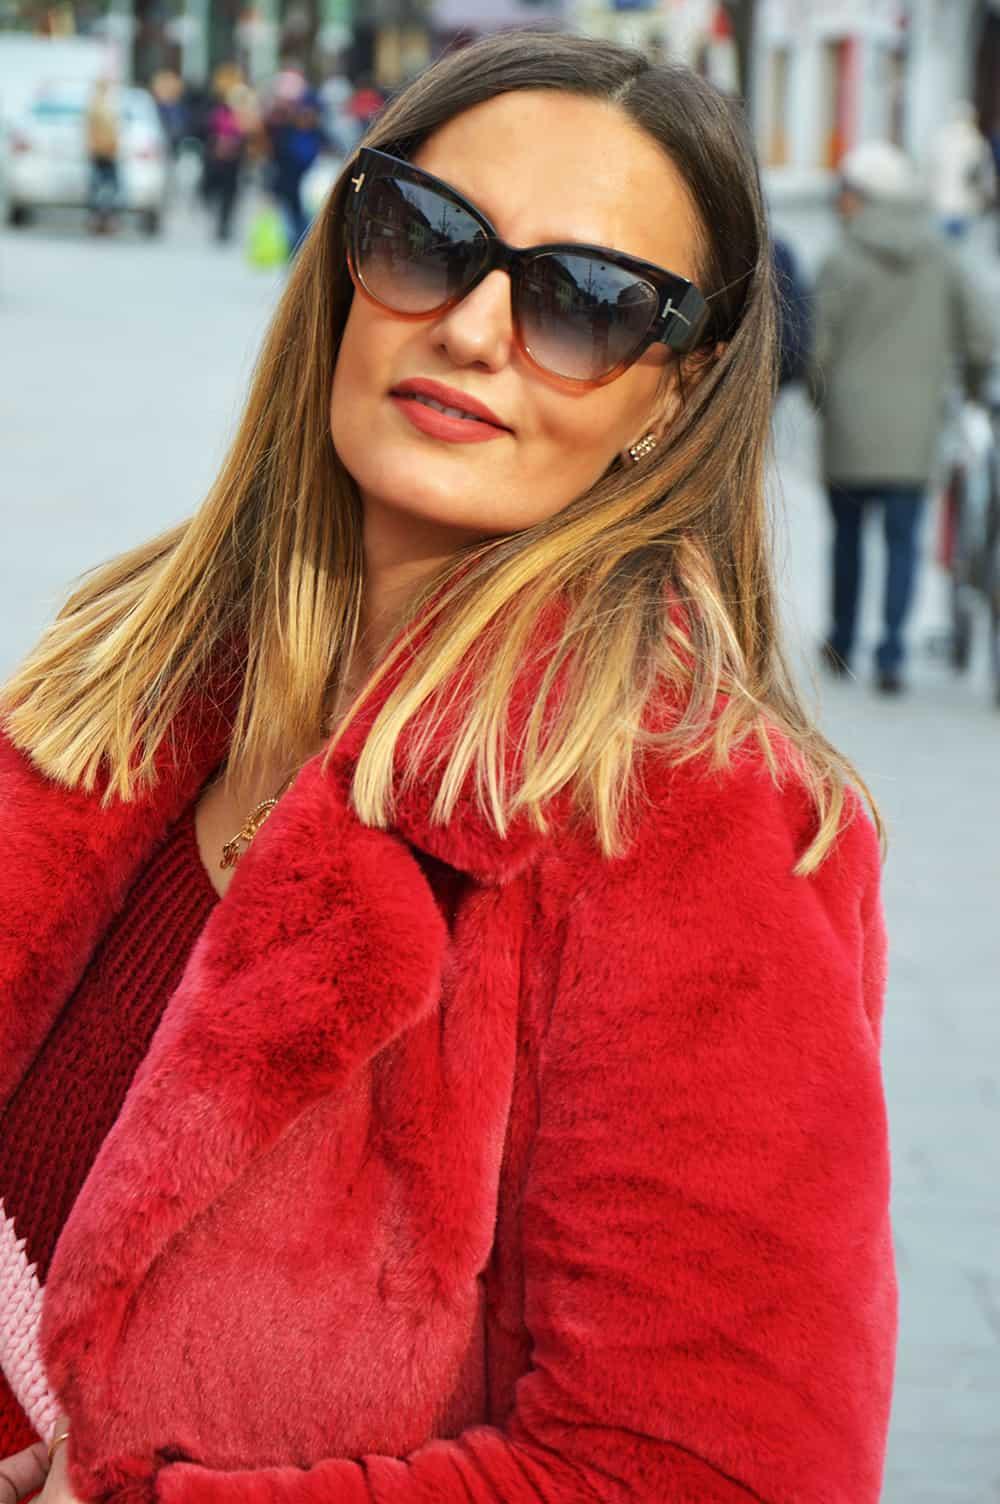 Red Fur Coat The Fashion Tag Blog